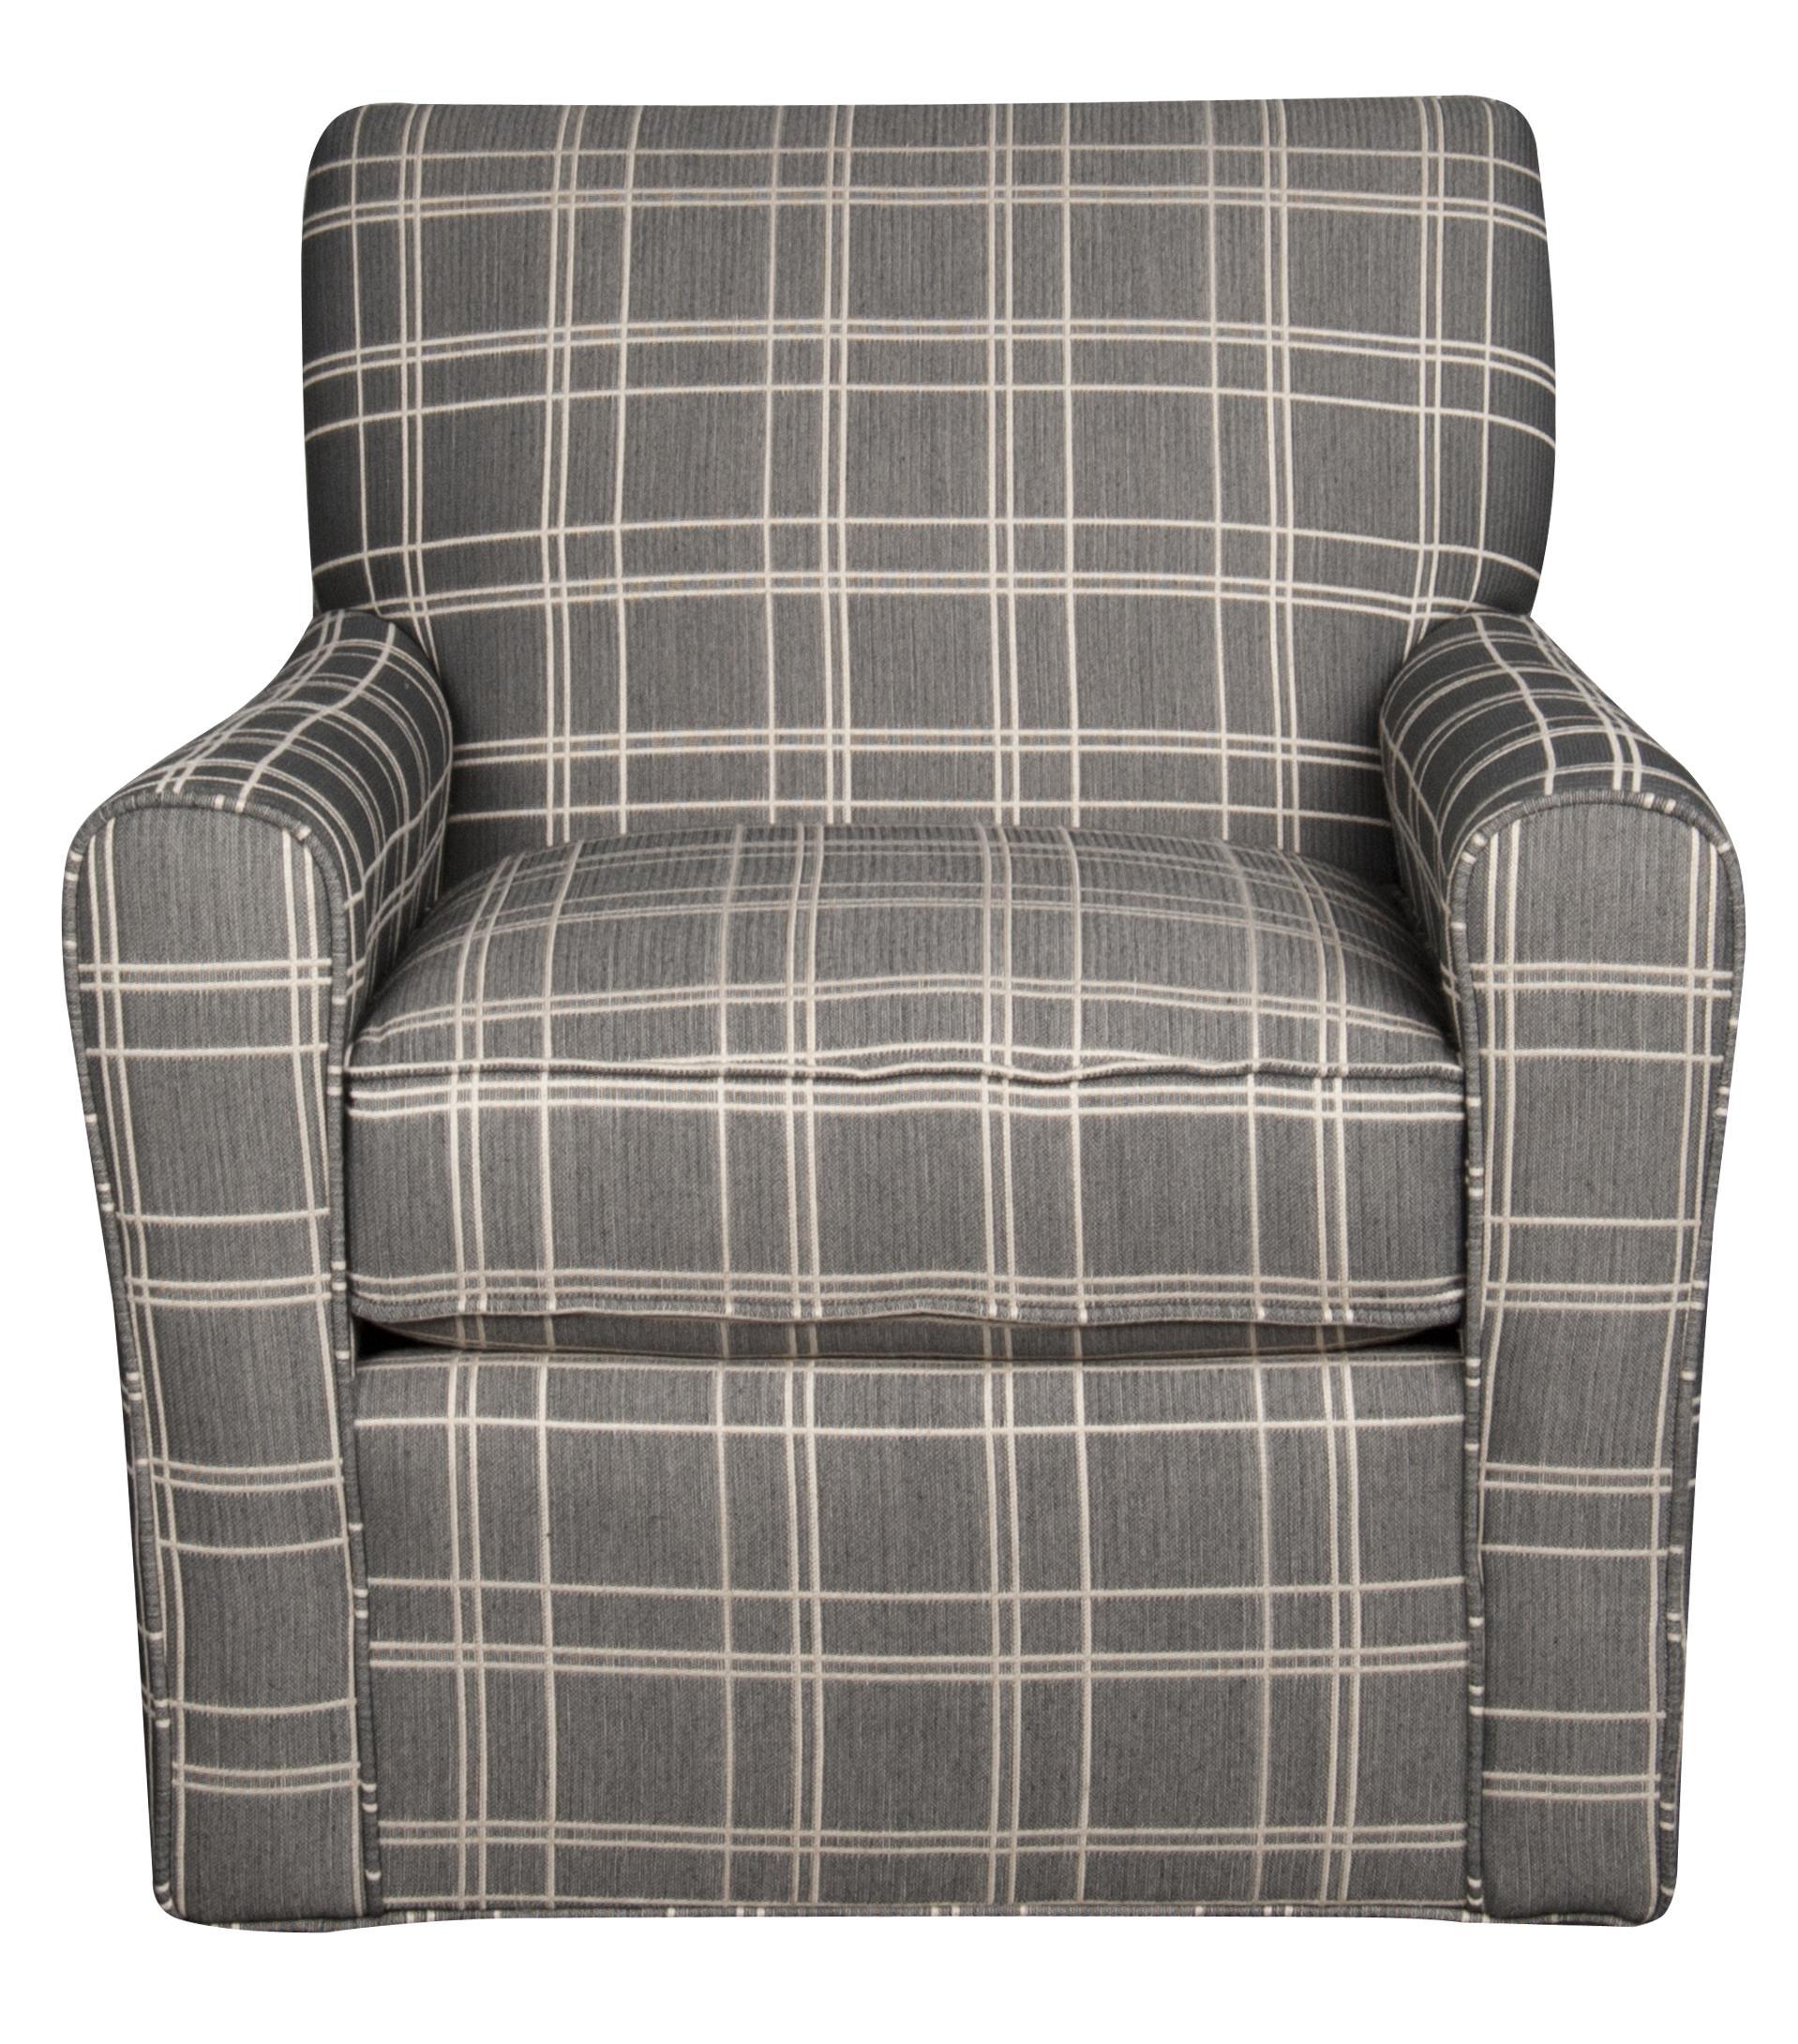 Sarah Sarah Swivel Chair by Craftmaster at Morris Home